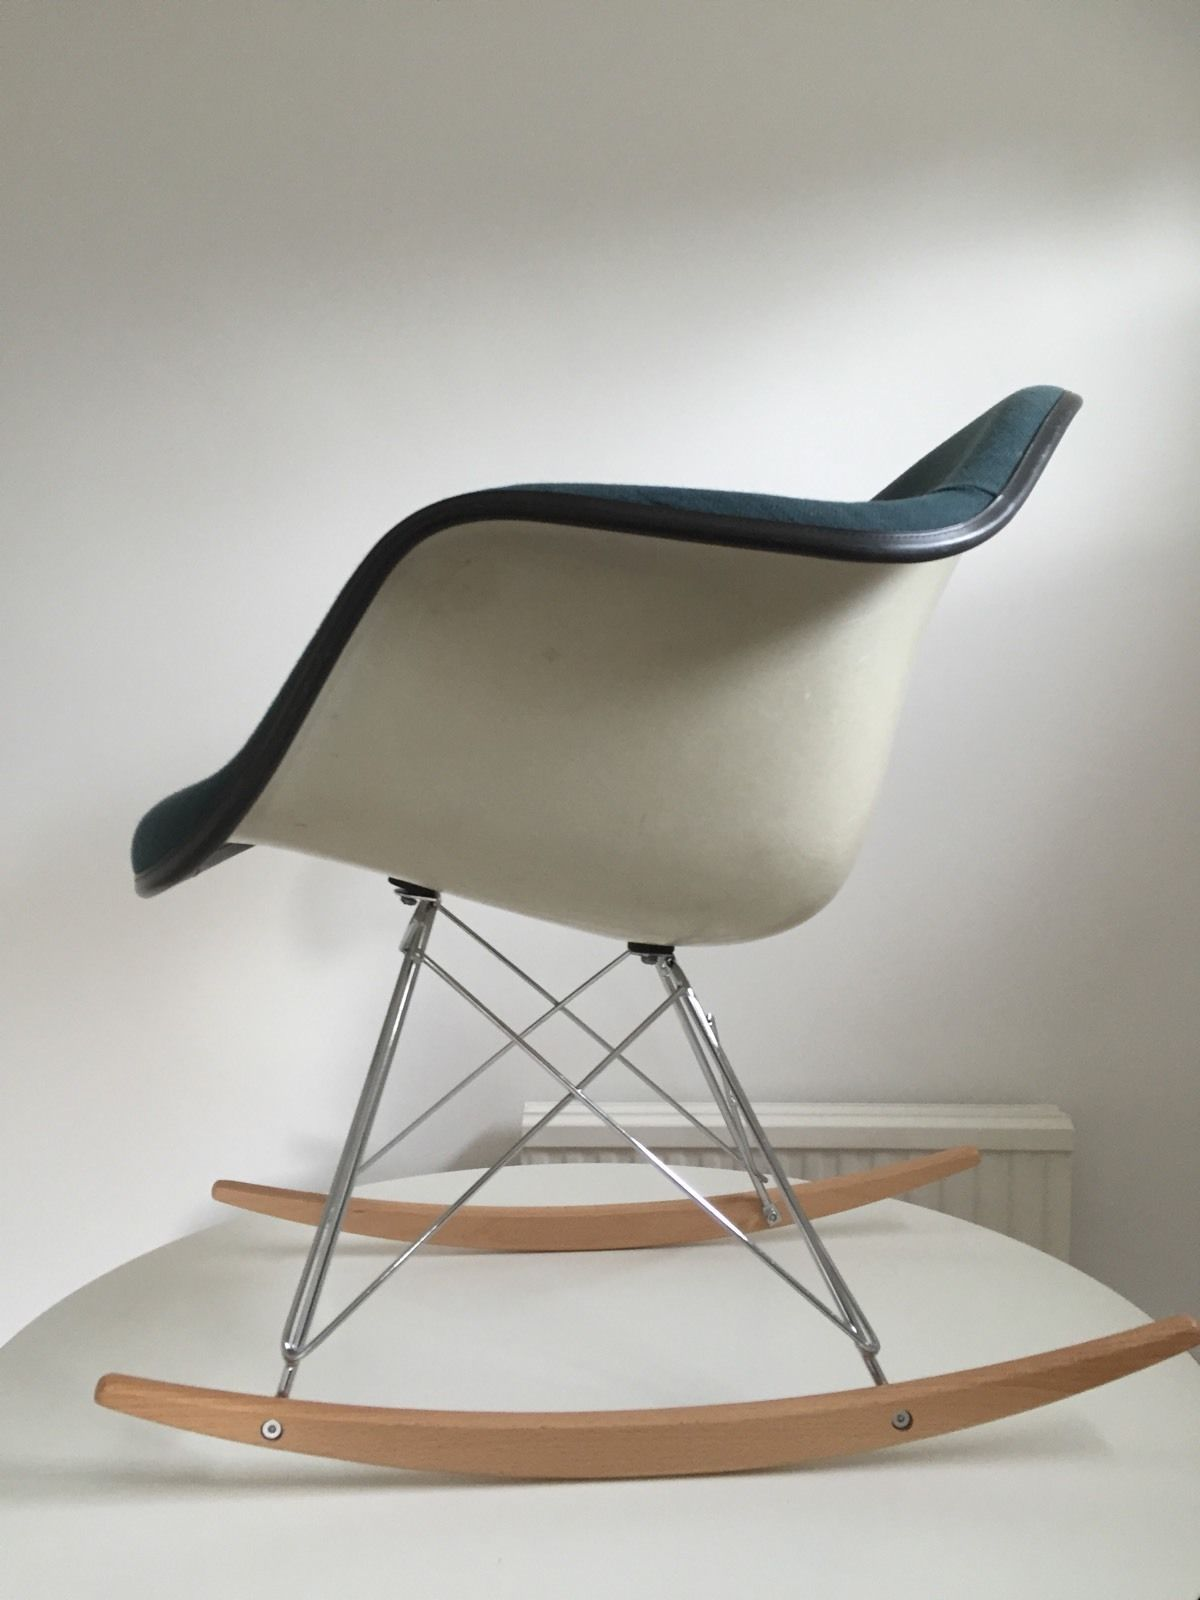 Details about Eames Herman Miller RAR Rocker Chair Vitra